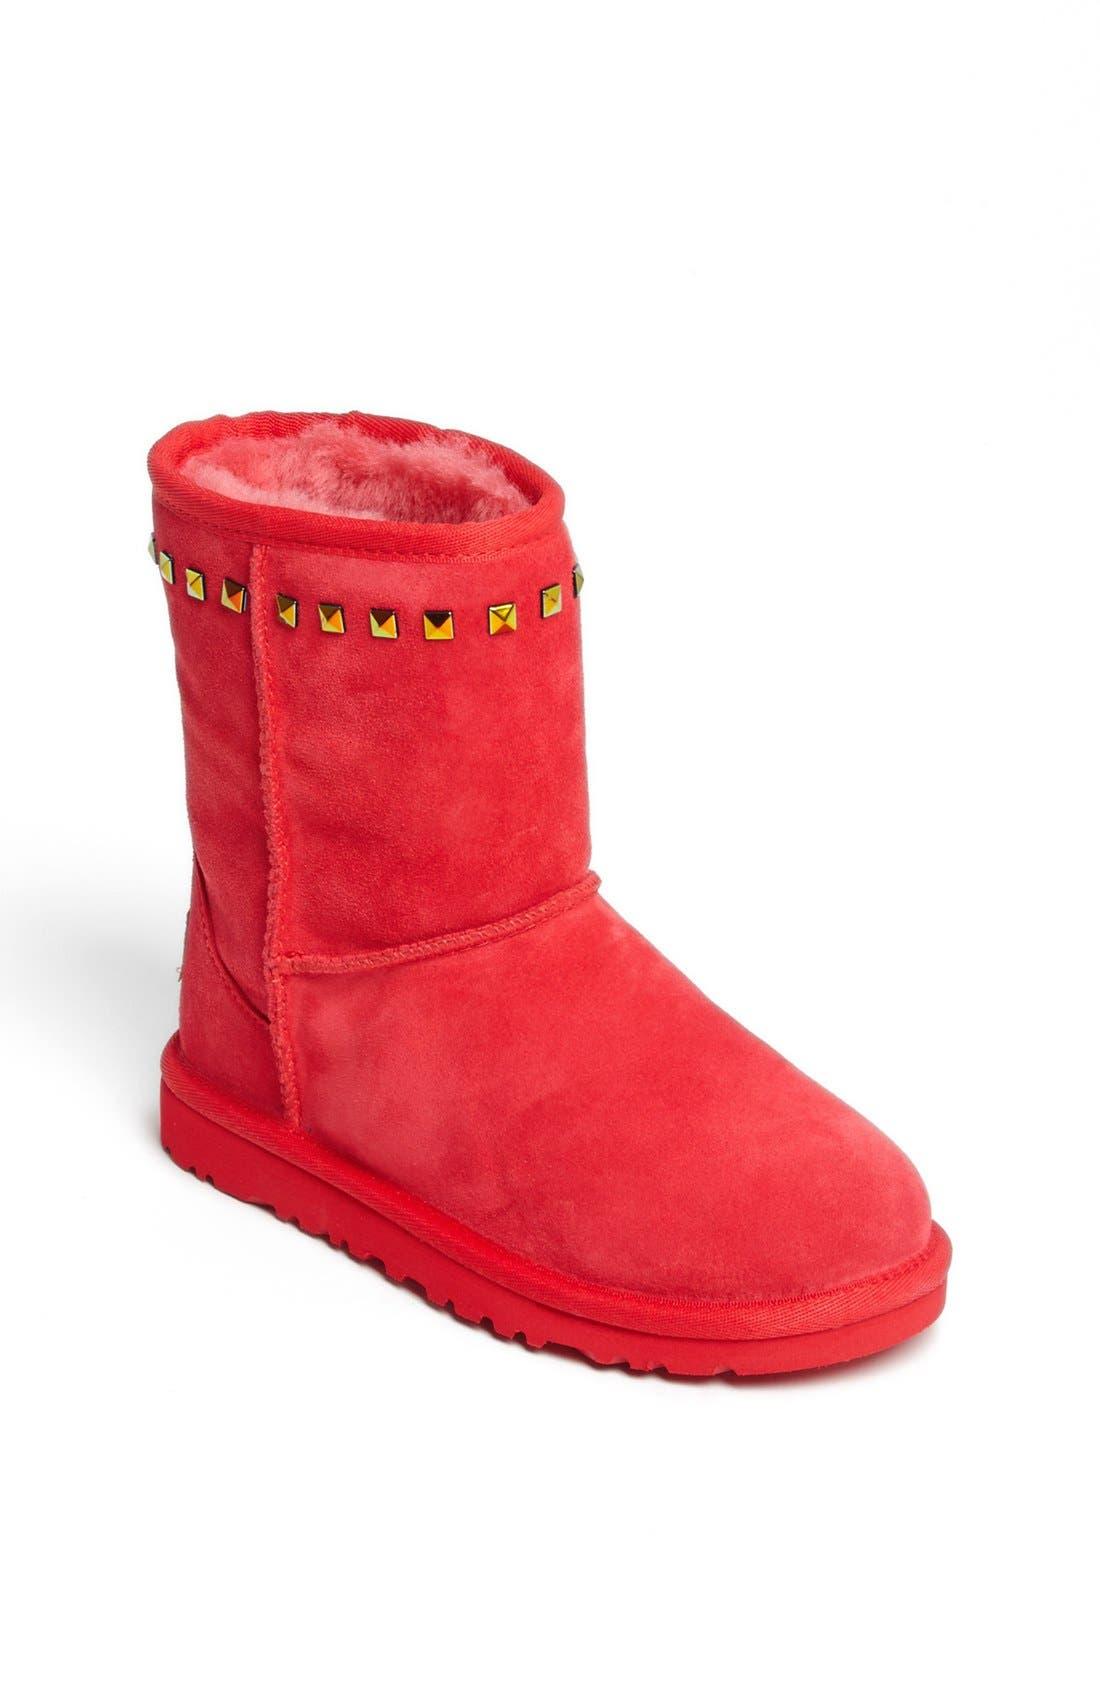 Main Image - UGG® Australia 'Classic Stud' Boot (Little Kid & Big Kid)